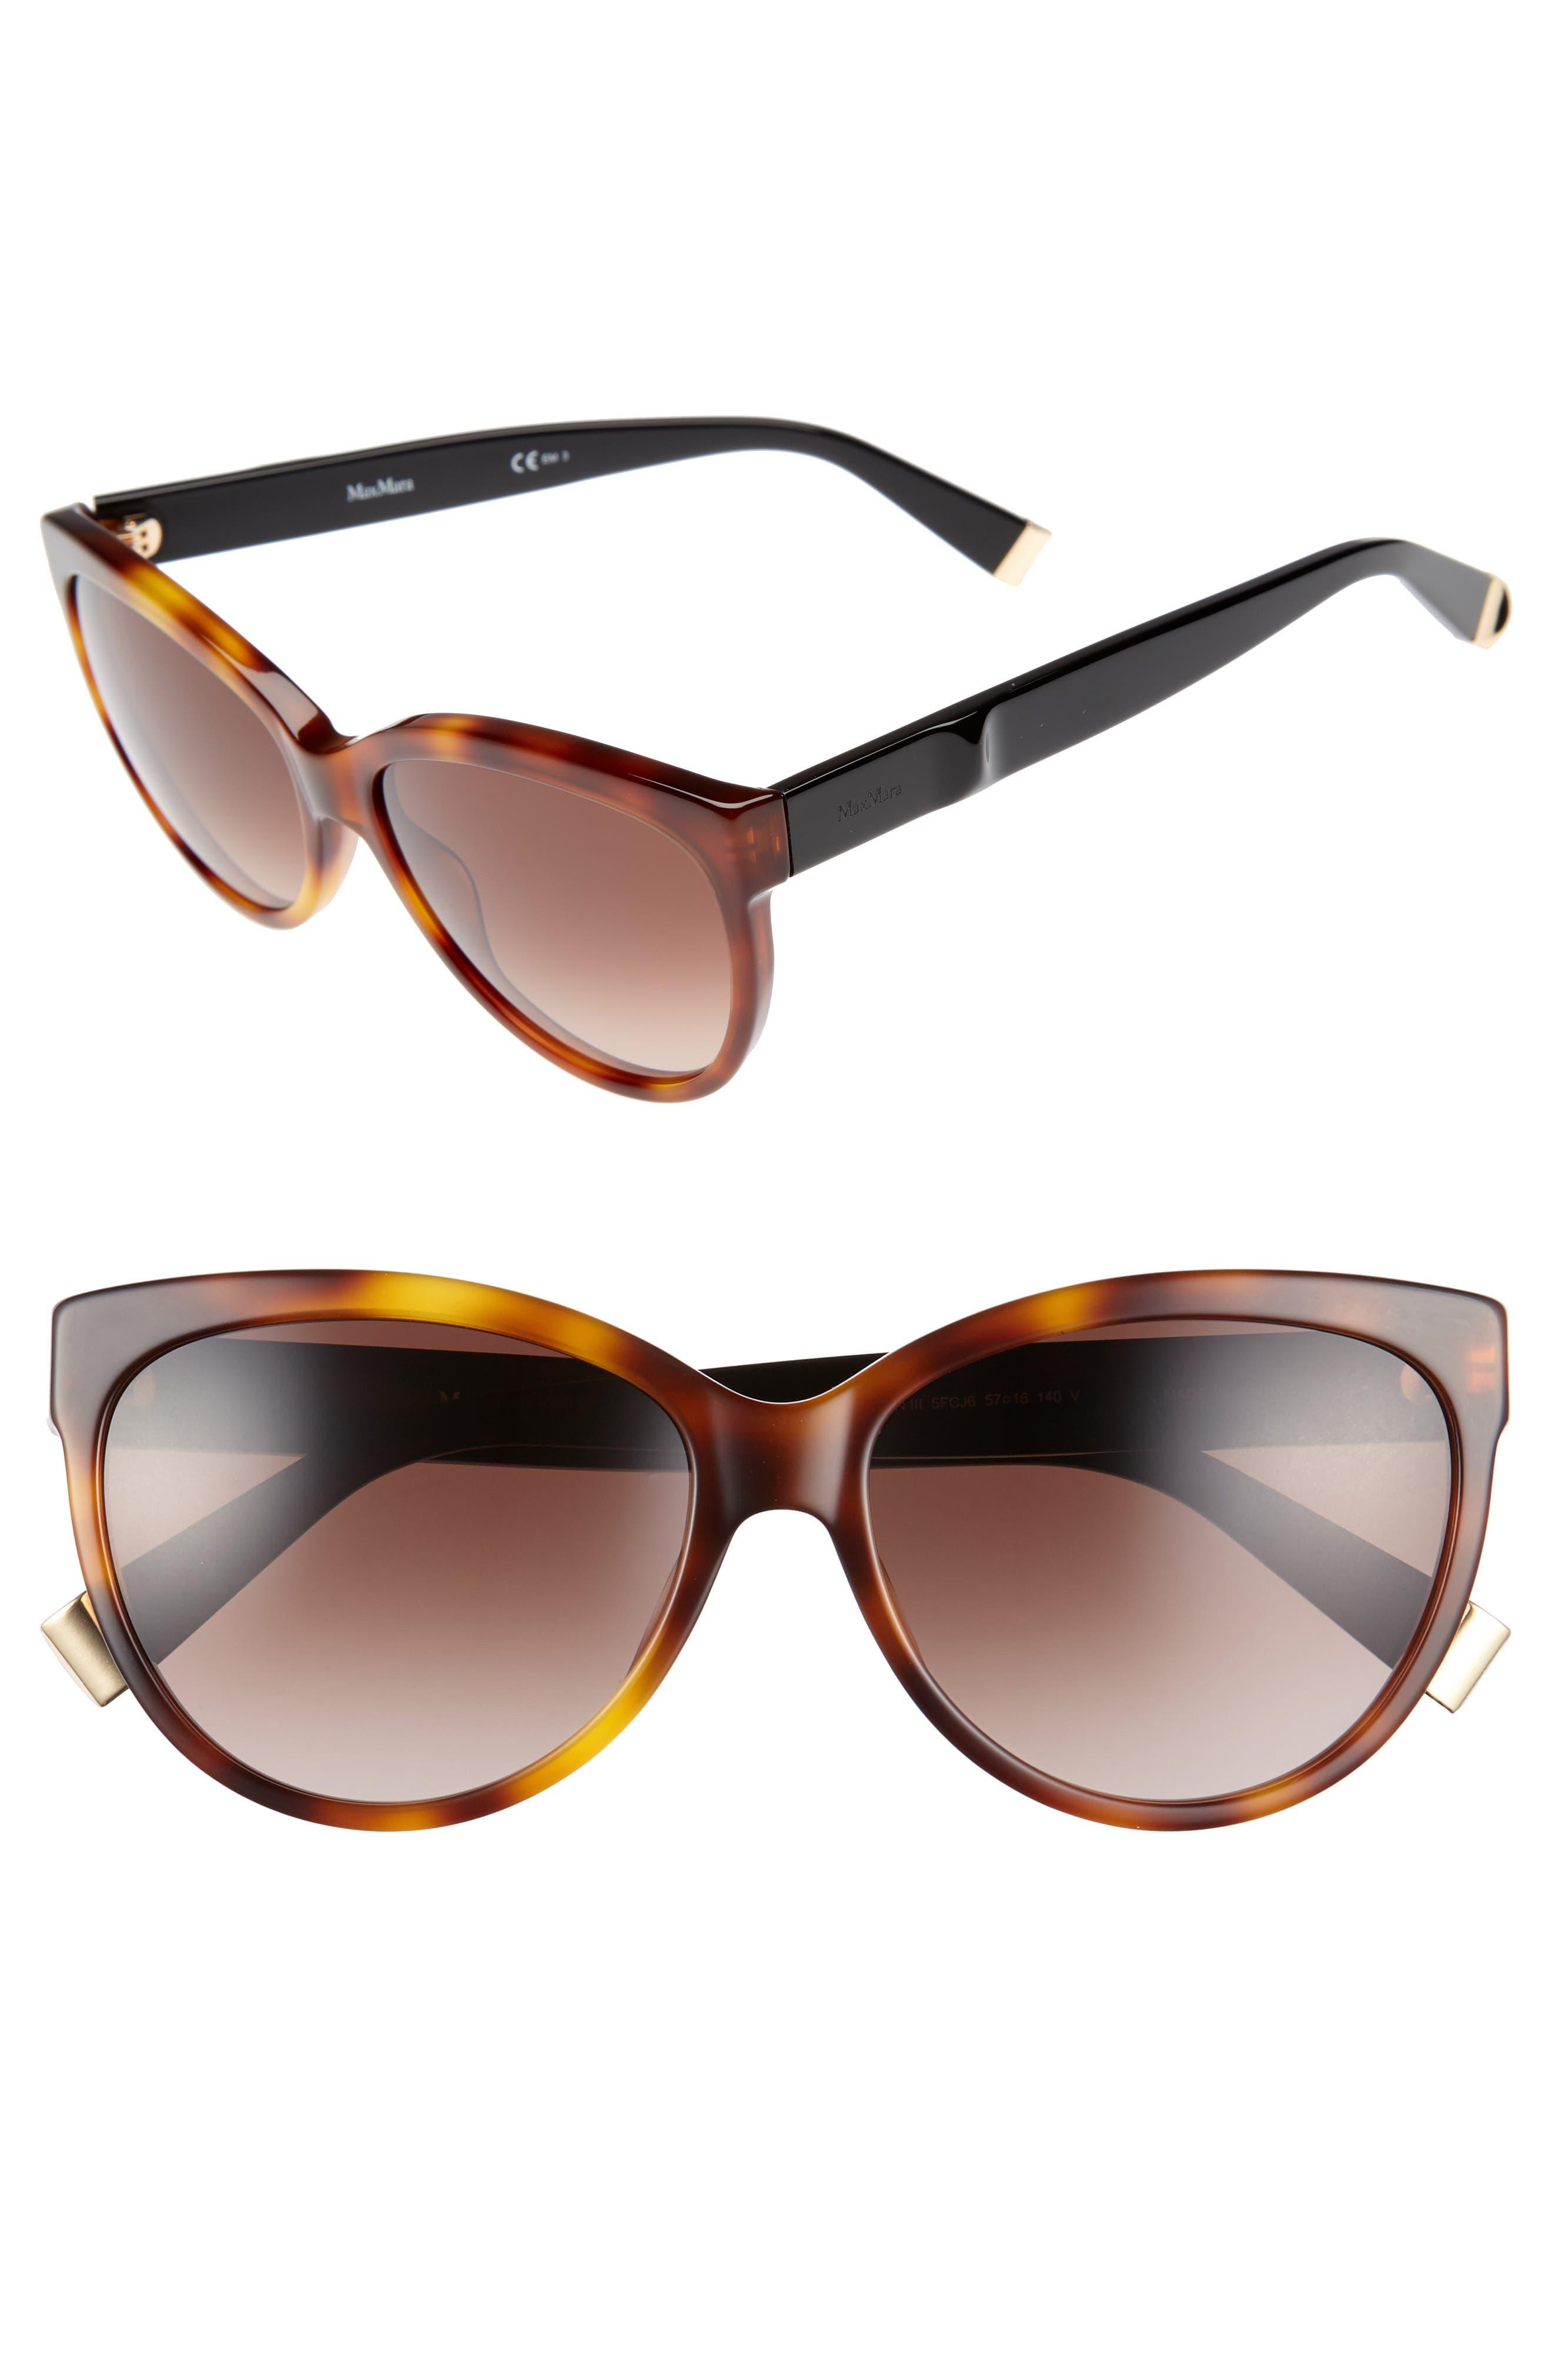 Moderii 57mm Gradient Cat Eye Sunglasses,                             Main thumbnail 2, color,